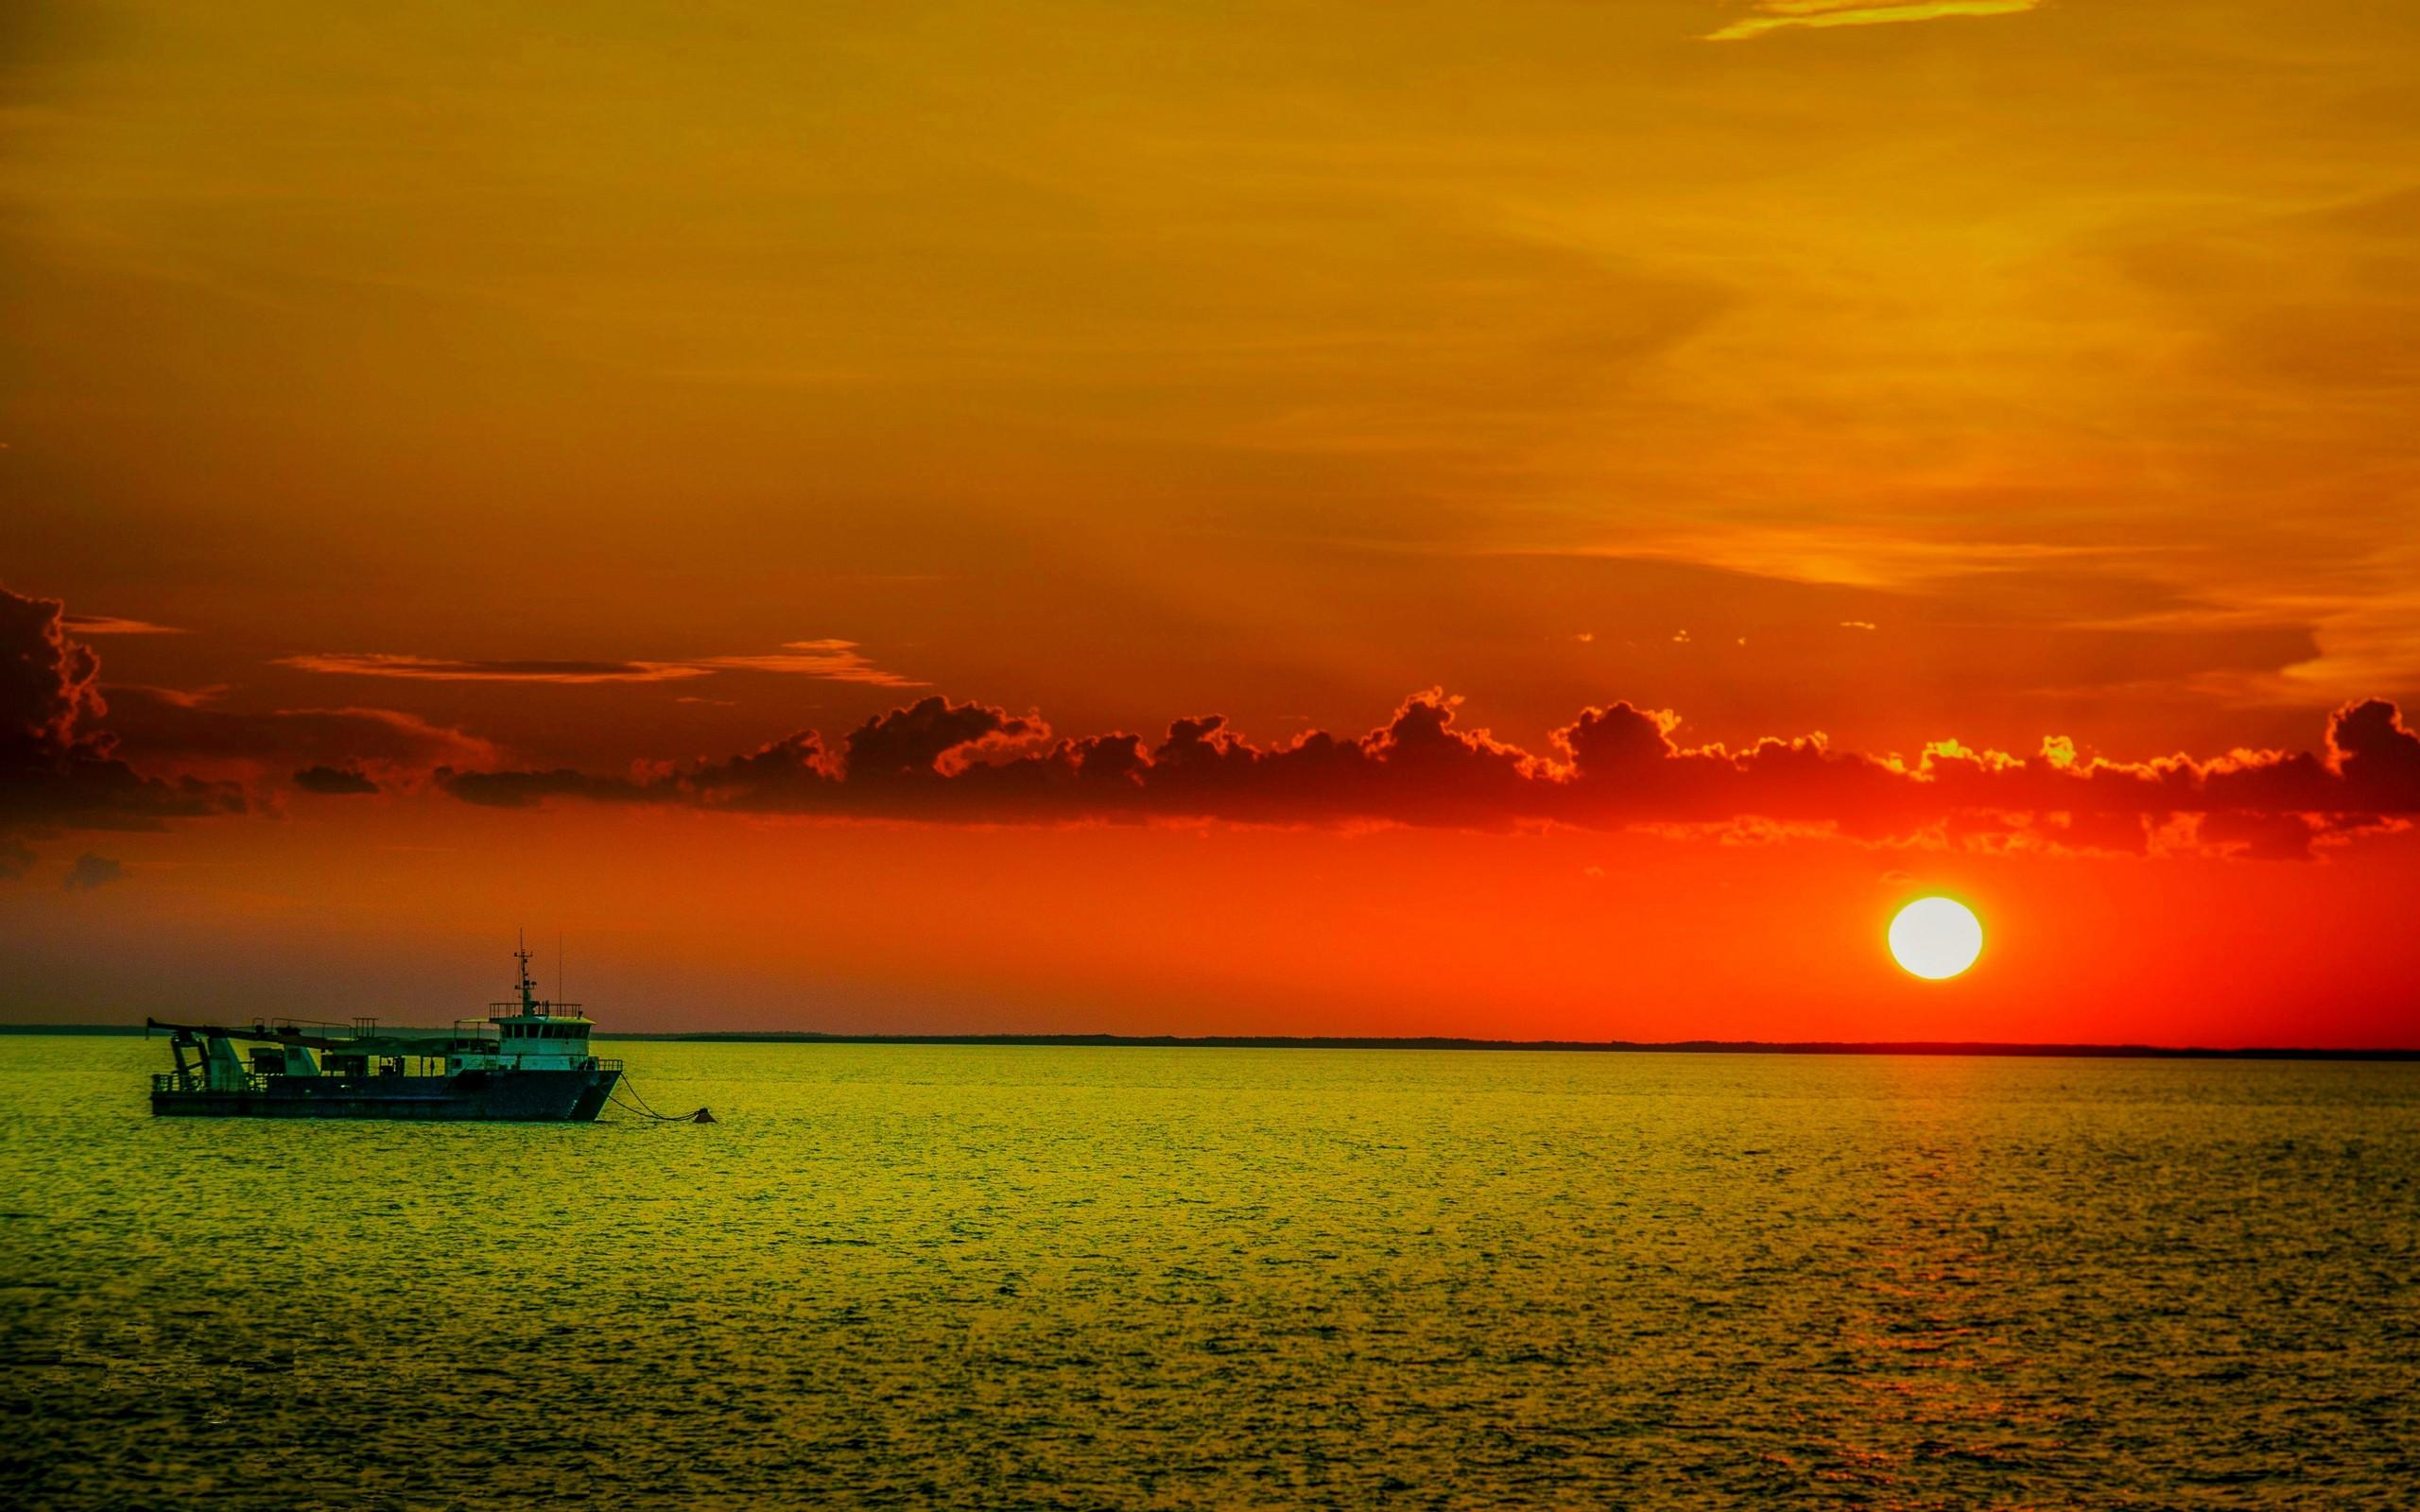 Открытки восходящего солнца